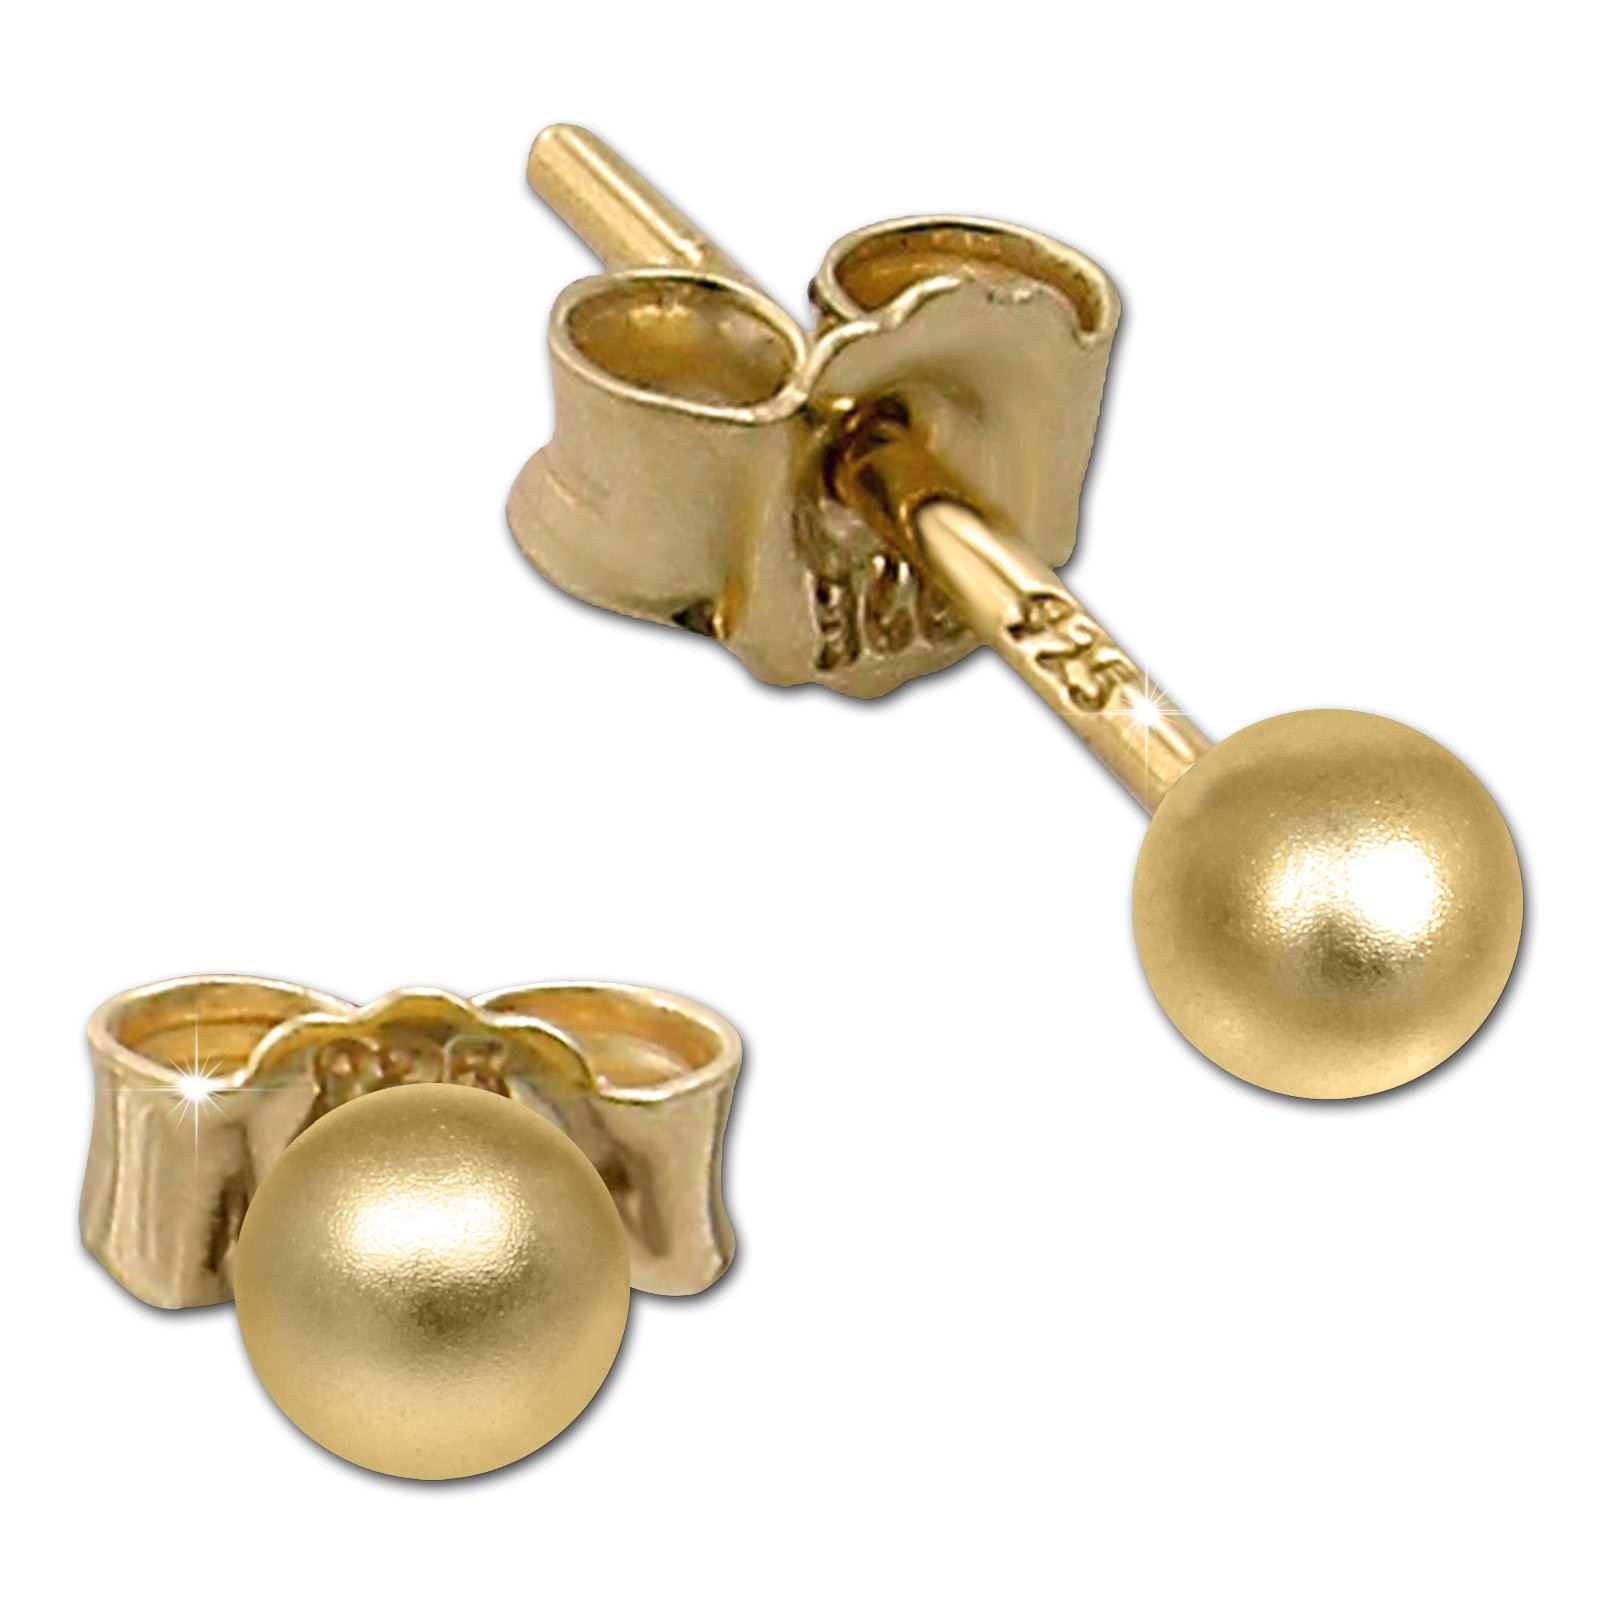 SilberDream Ohrringe Kugel matt 925 Silber vergoldet Ohrstecker SDO597Y3M